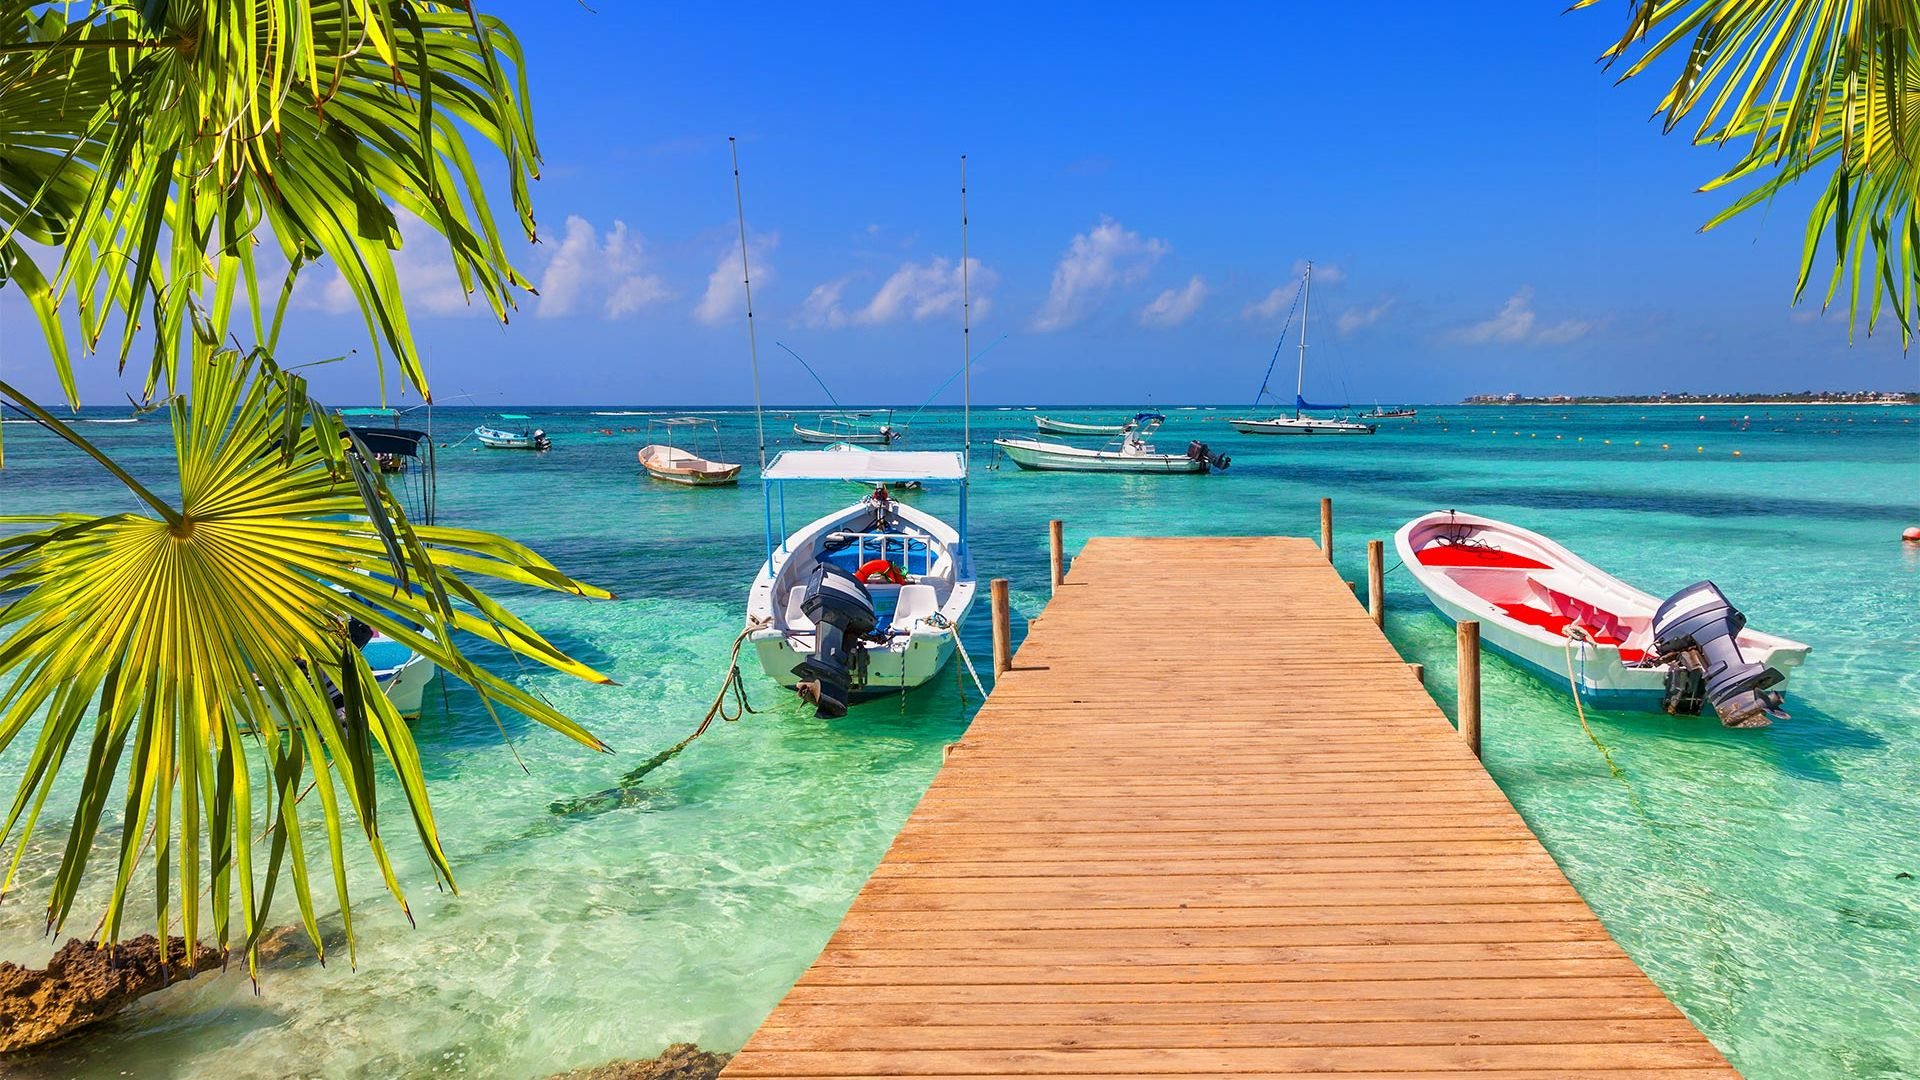 Sejur plaja Riviera Maya, Mexic, 9 zile - mai 2022